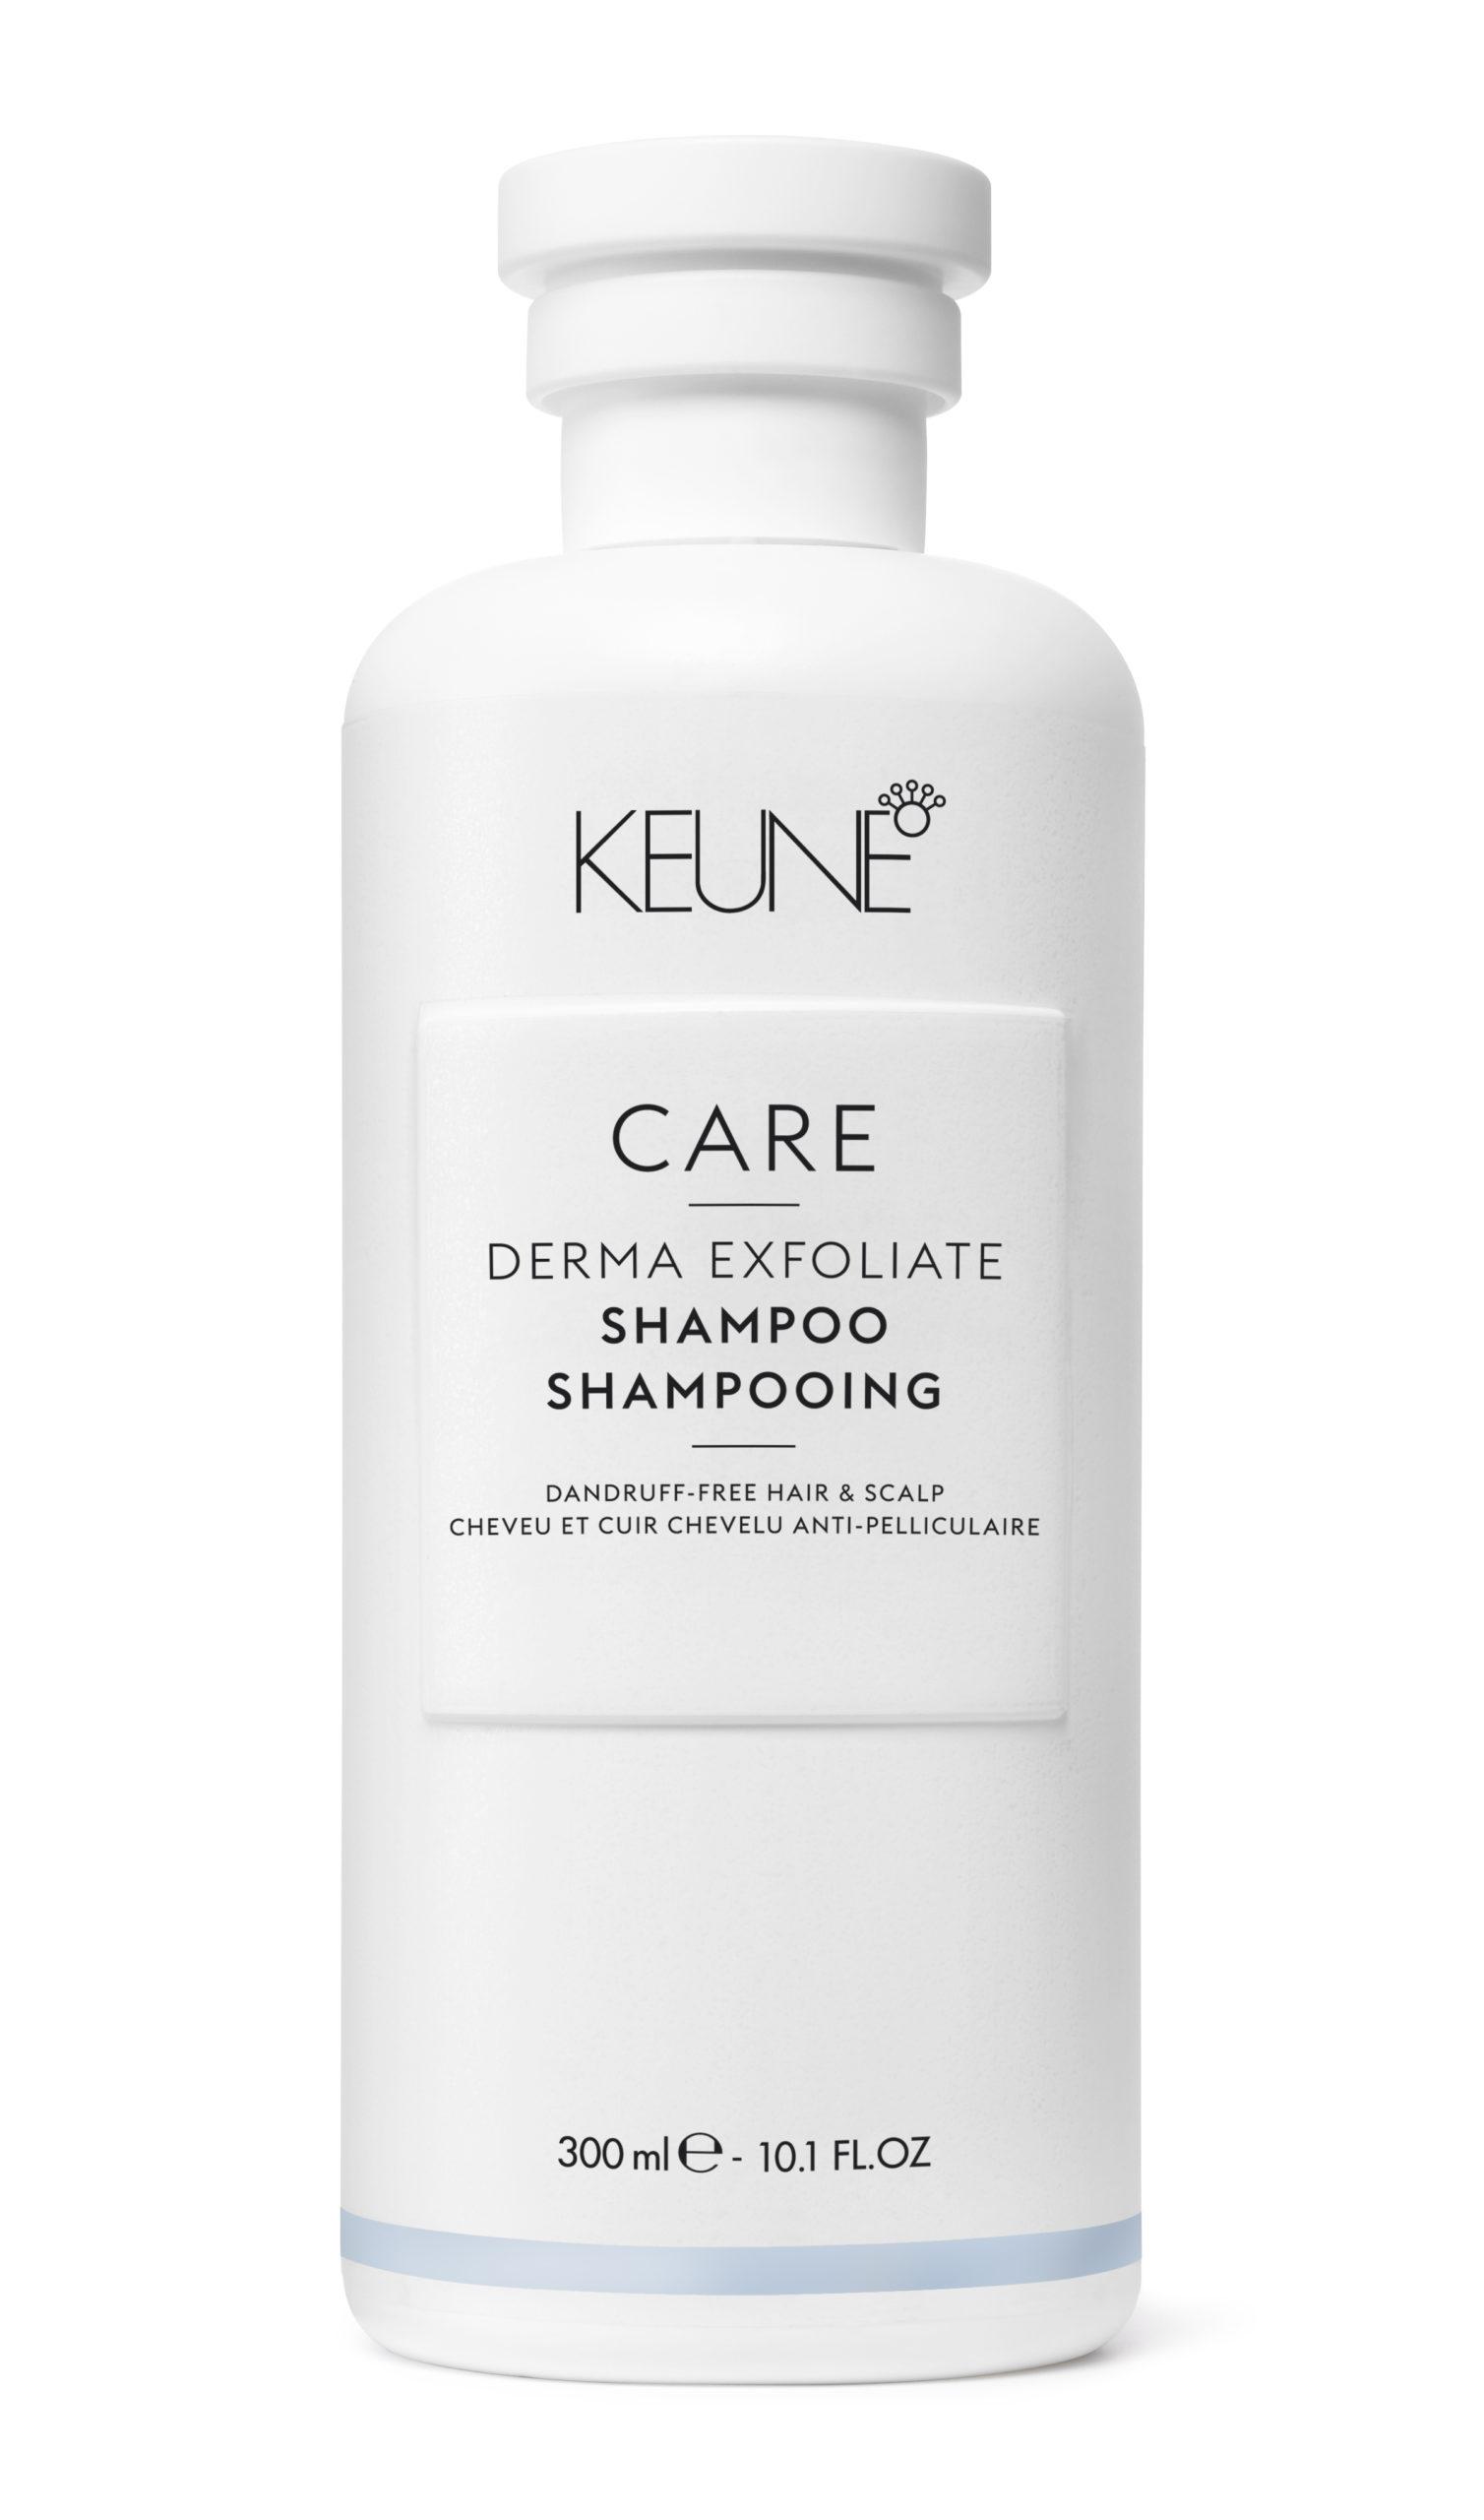 Care-Derma-Exfoliate-Shampoo-300ml-Highres